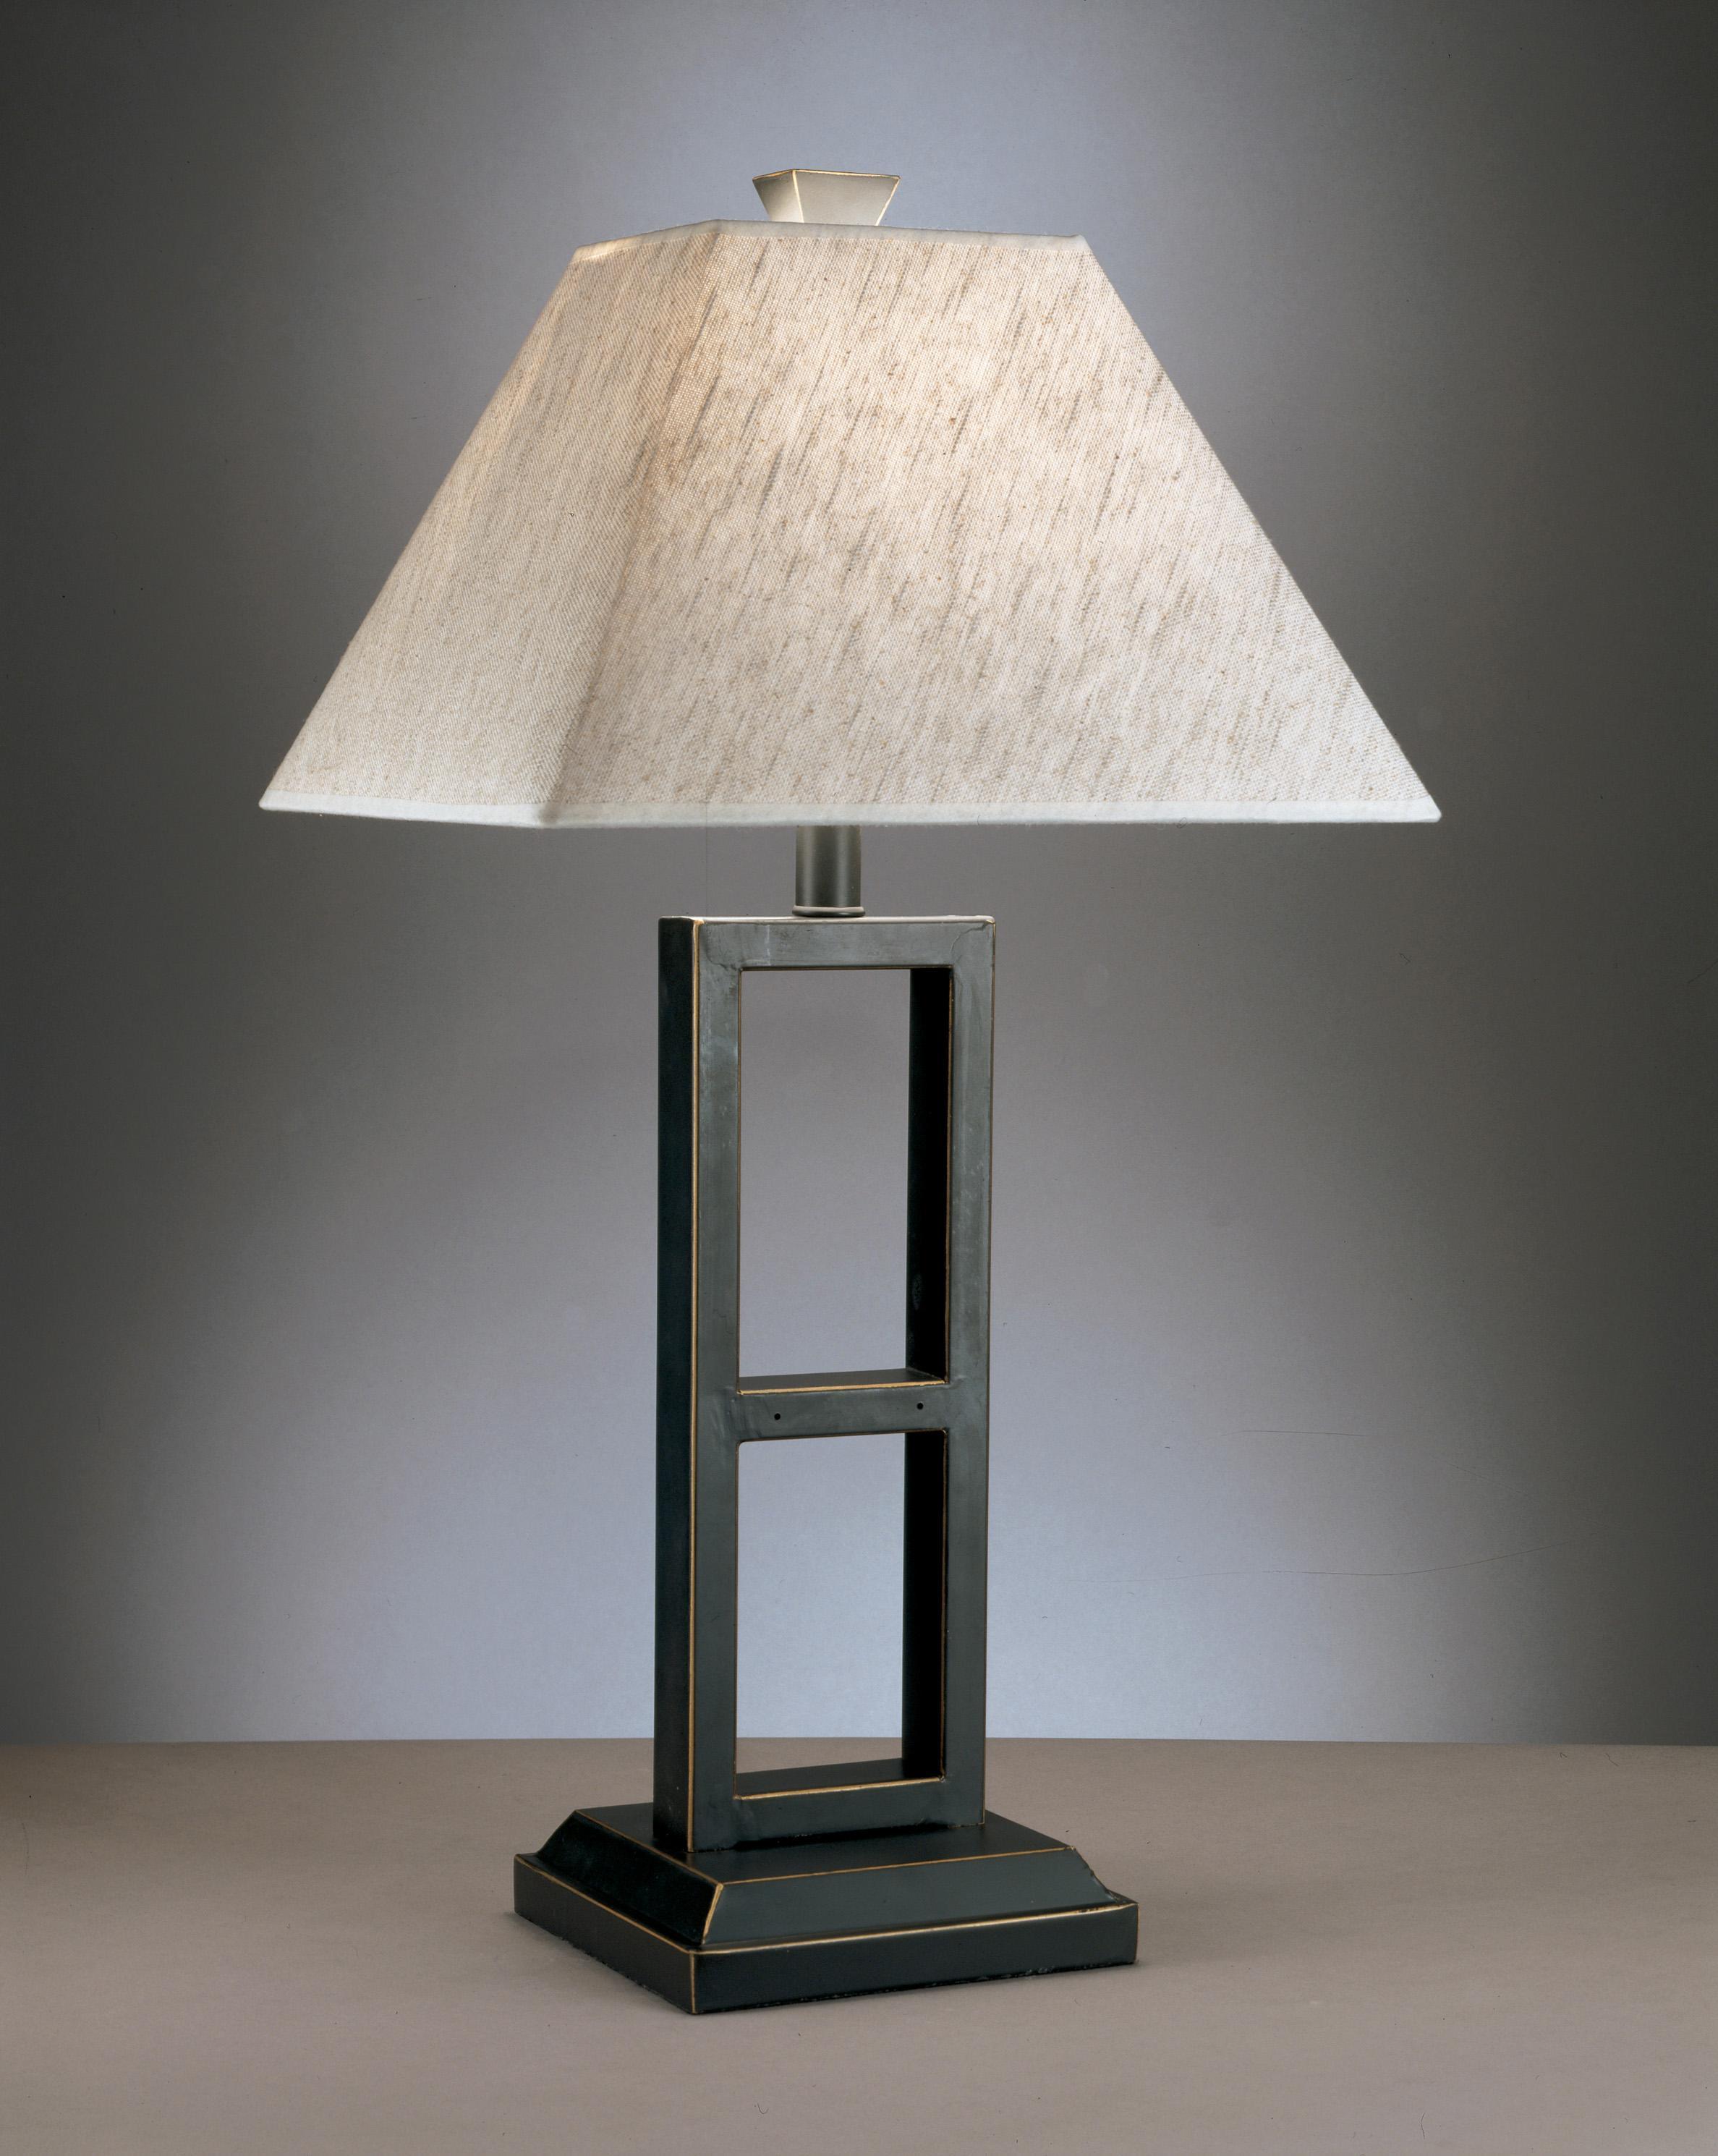 design by ashley furniture lamps contemporary deidra table lamp. Black Bedroom Furniture Sets. Home Design Ideas